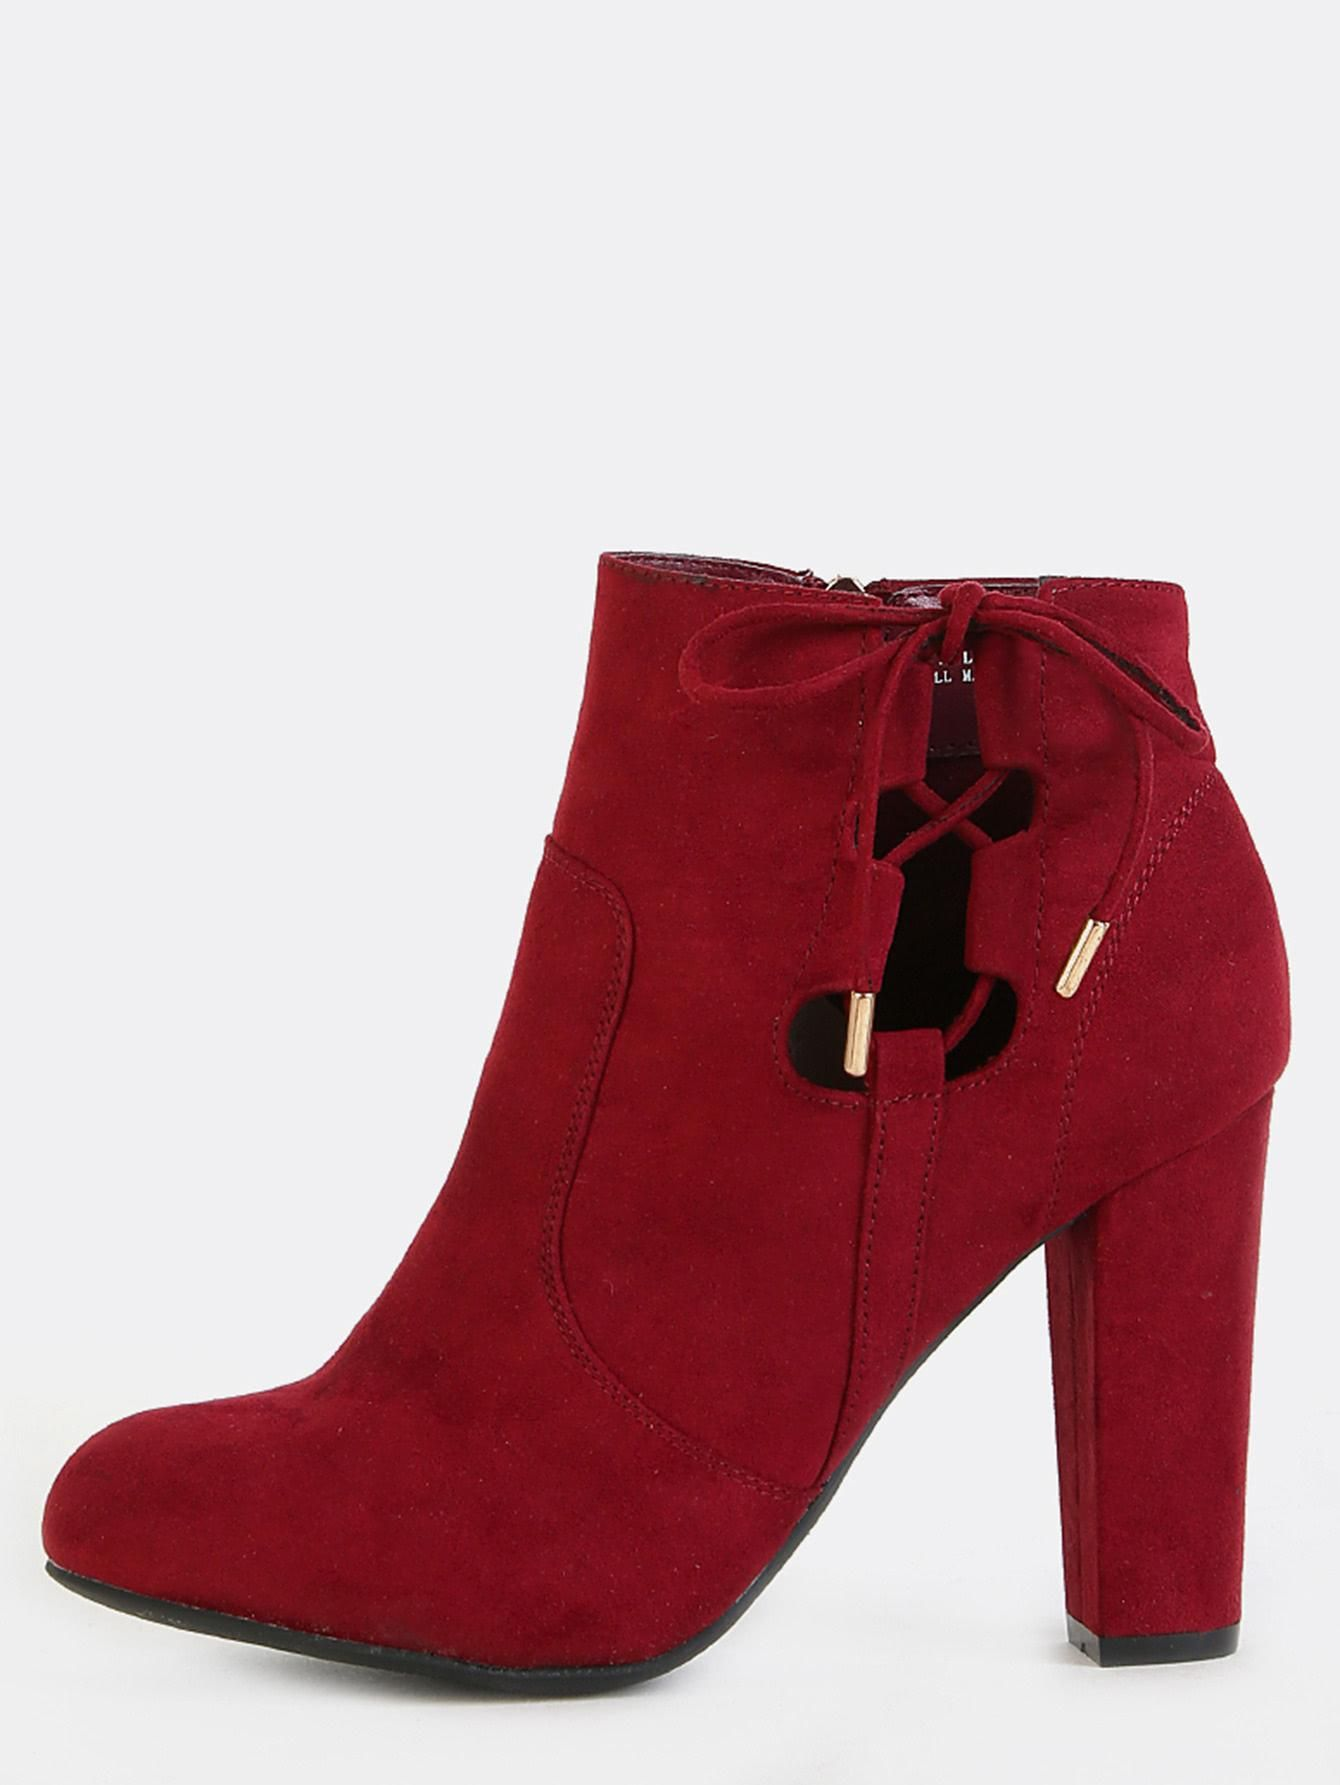 #AdoreWe #MakeMeChic MAKEMECHIC Faux Suede Chunky Heel Ankle Boots BURGUNDY - AdoreWe.com